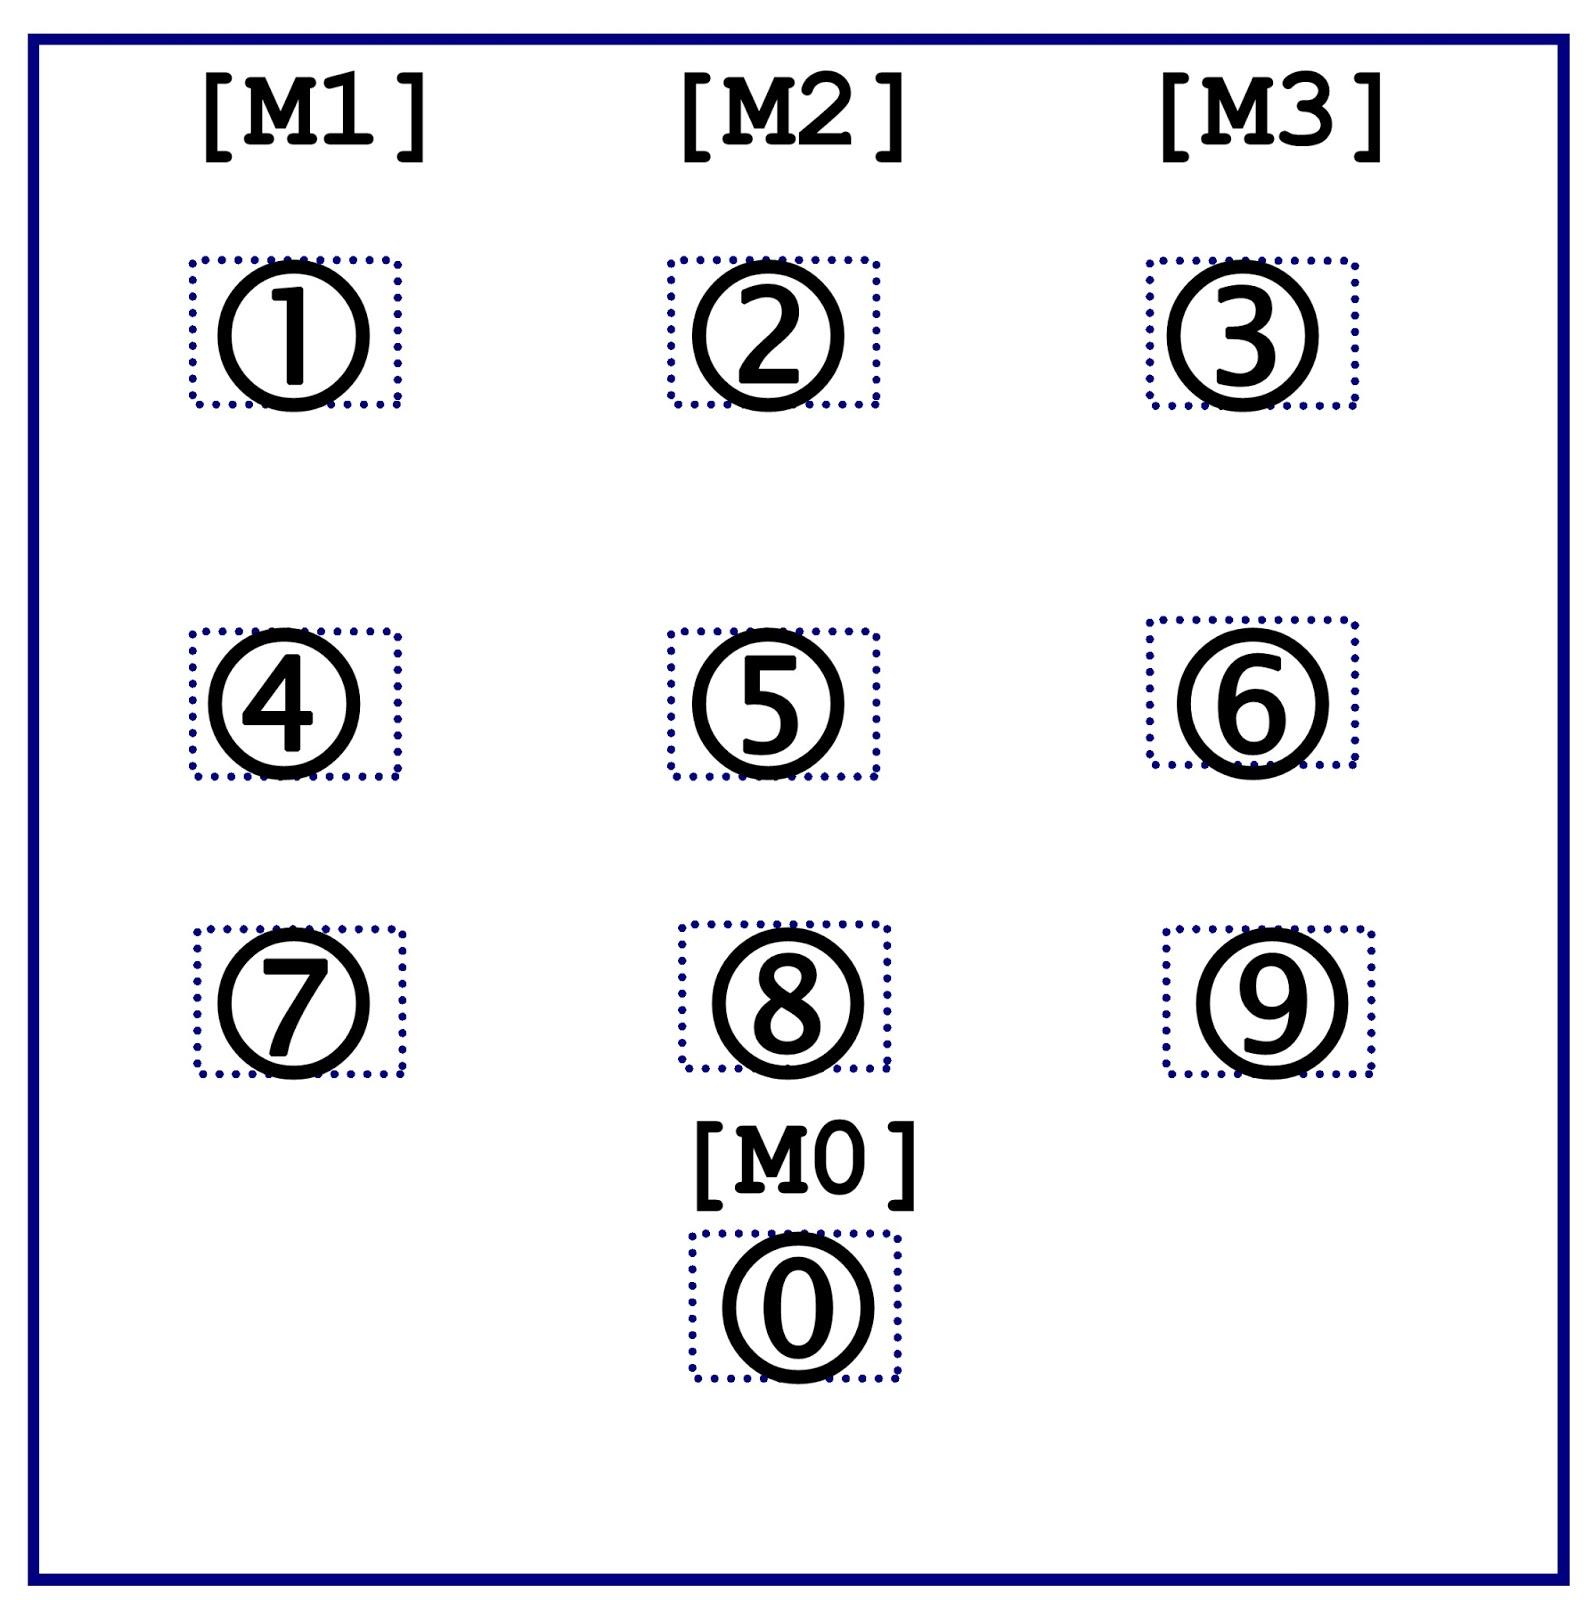 Akai Universal Remote Codes